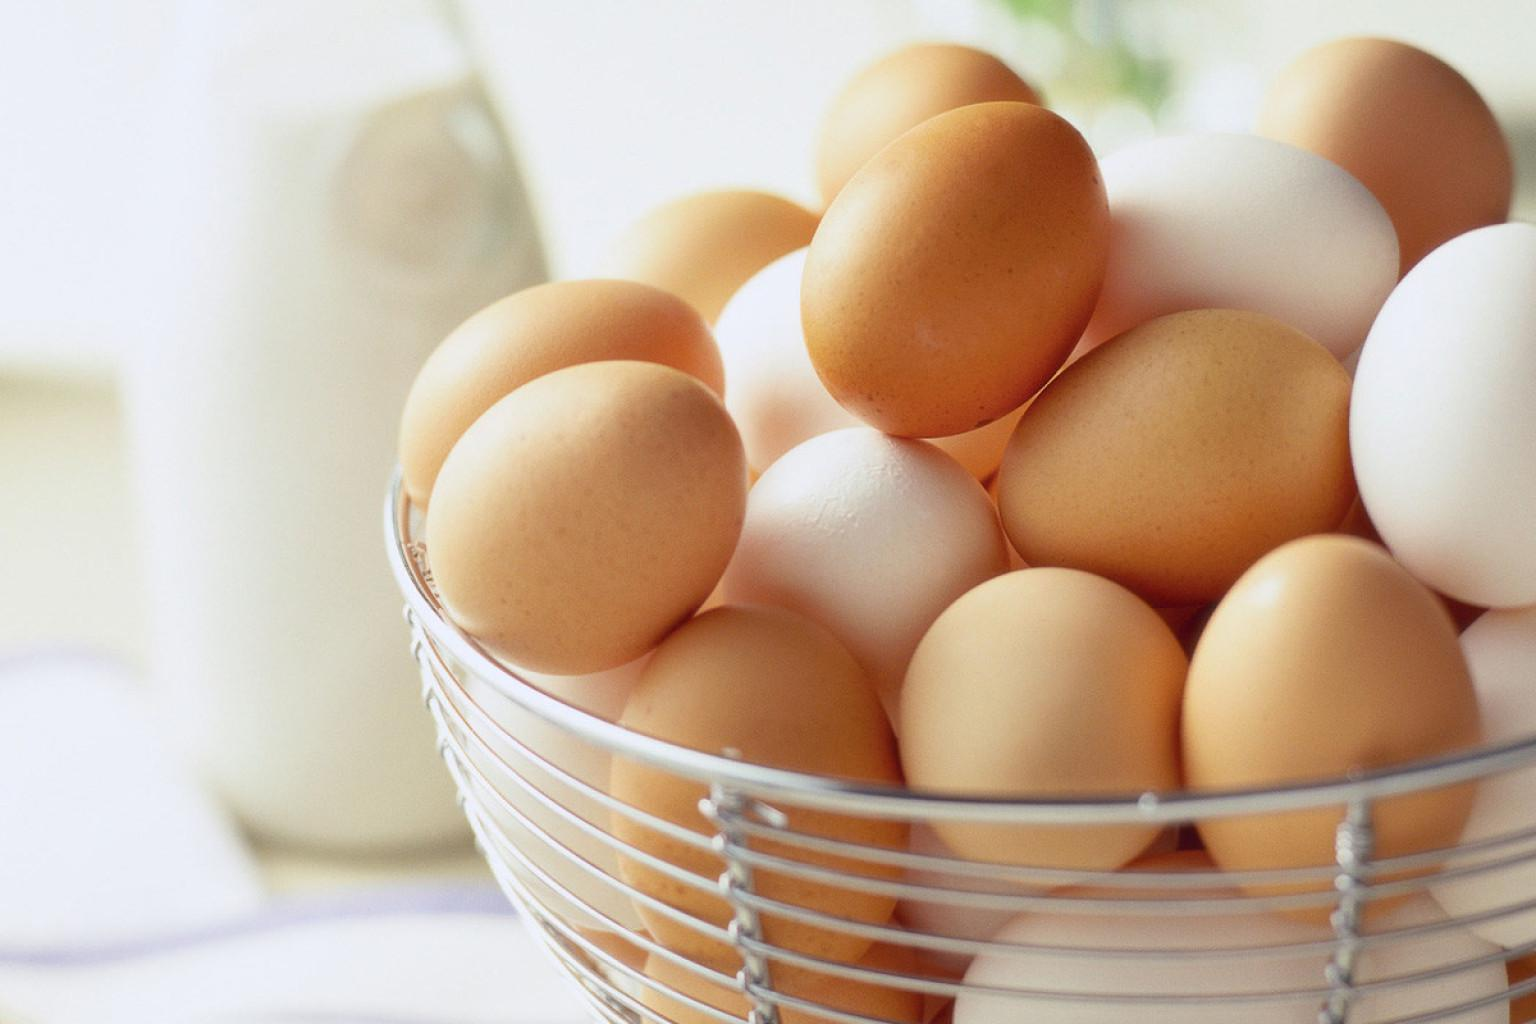 Berbahaya, sebaiknya kamu nggak mencuci telur sebelum disimpan. Simak alasannya di sini! (Sumber Foto: Alamy/Huffington Post)